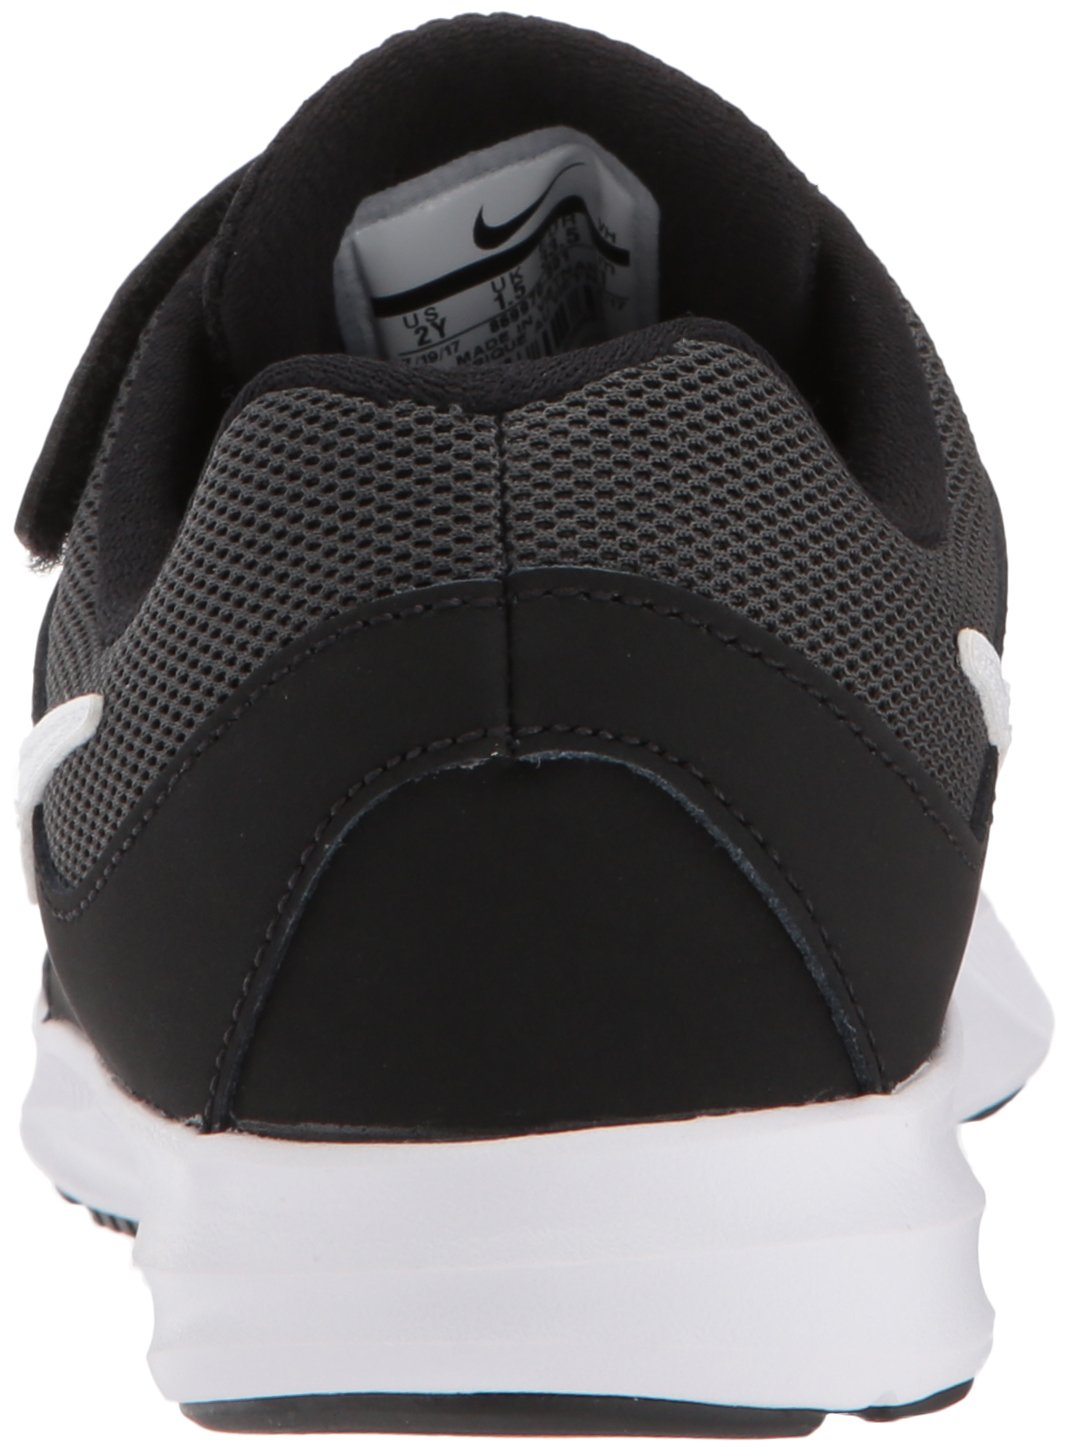 Nike Boys' Downshifter 7 (PSV) Running Shoe, Black/White-Anthracite, 3 M US Little Kid by Nike (Image #2)